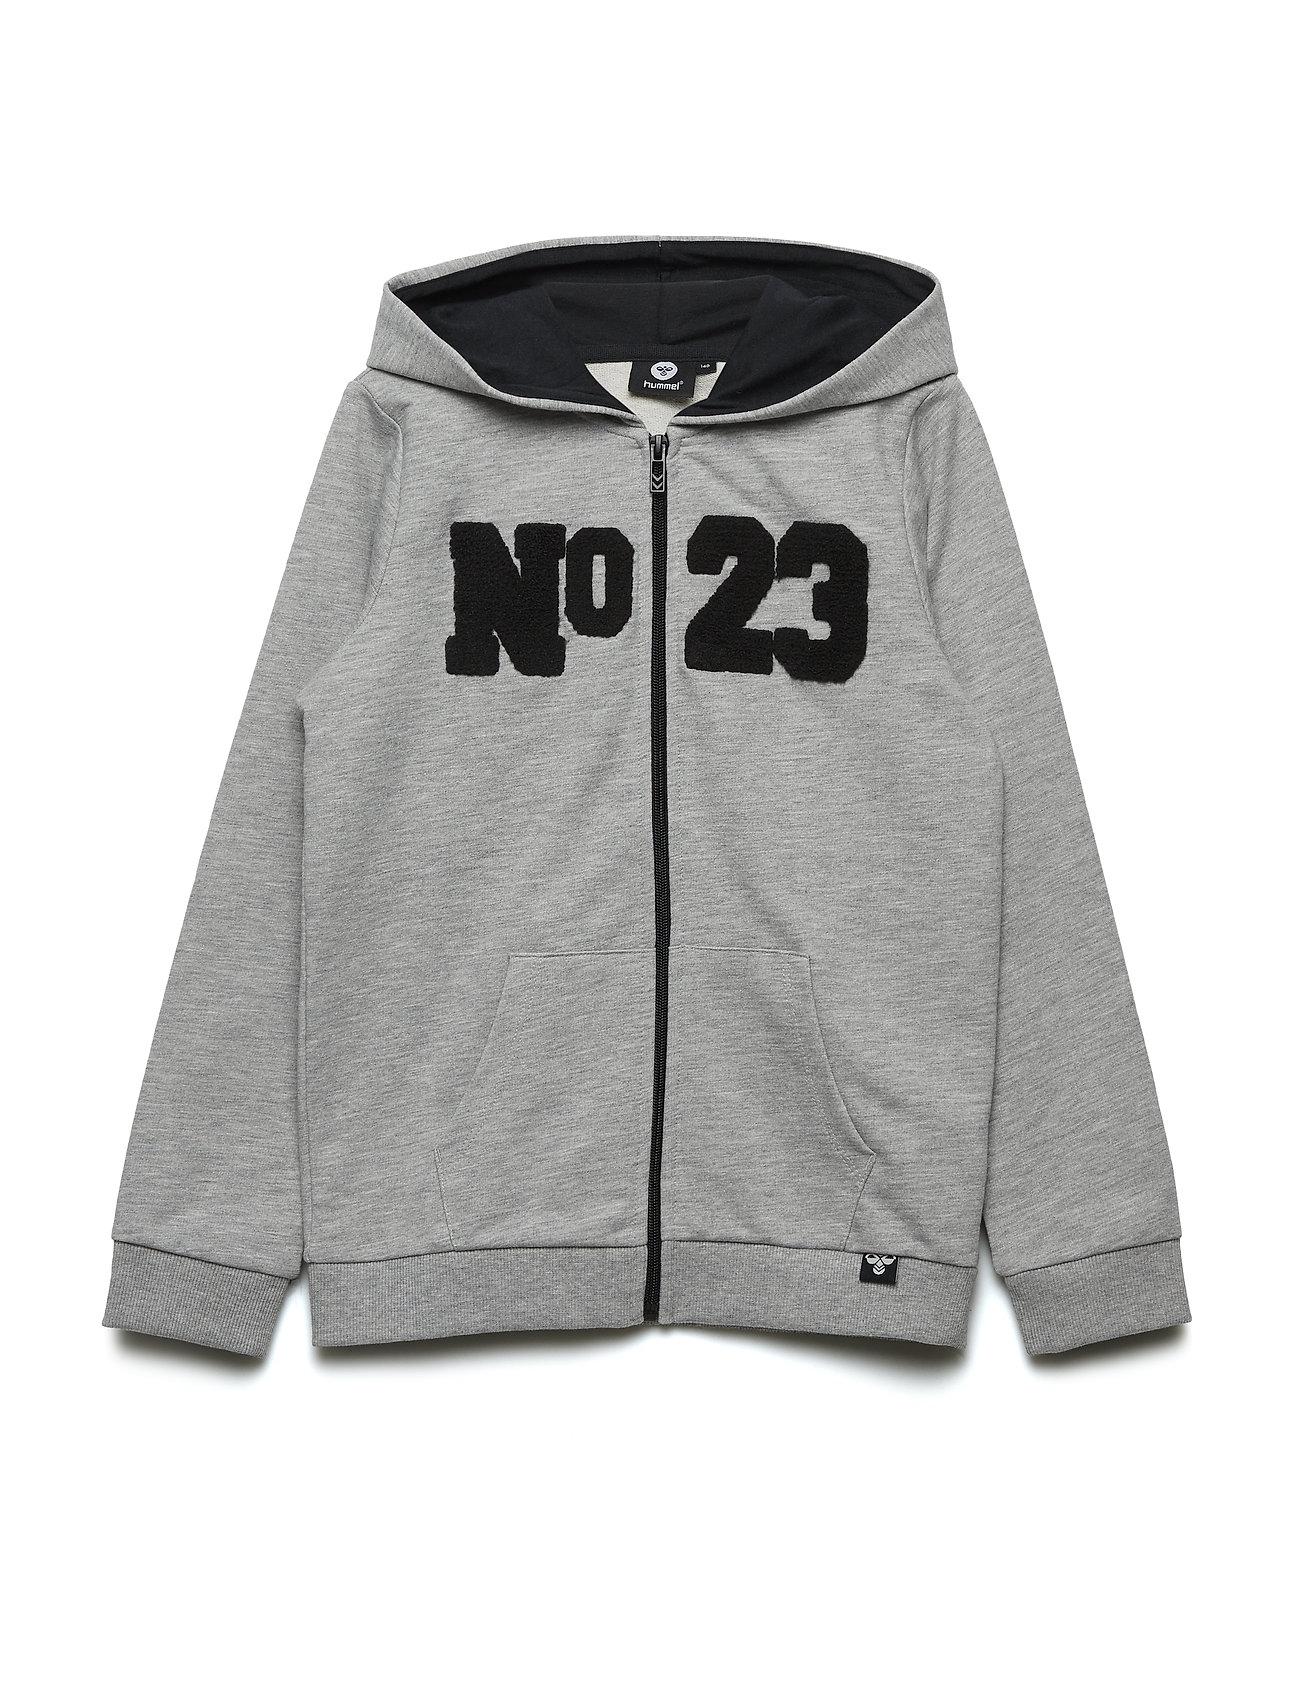 23ce1fd4 Hmlbilly Zip Hoodie (Grey Melange) (29.97 €) - Hummel - | Boozt.com